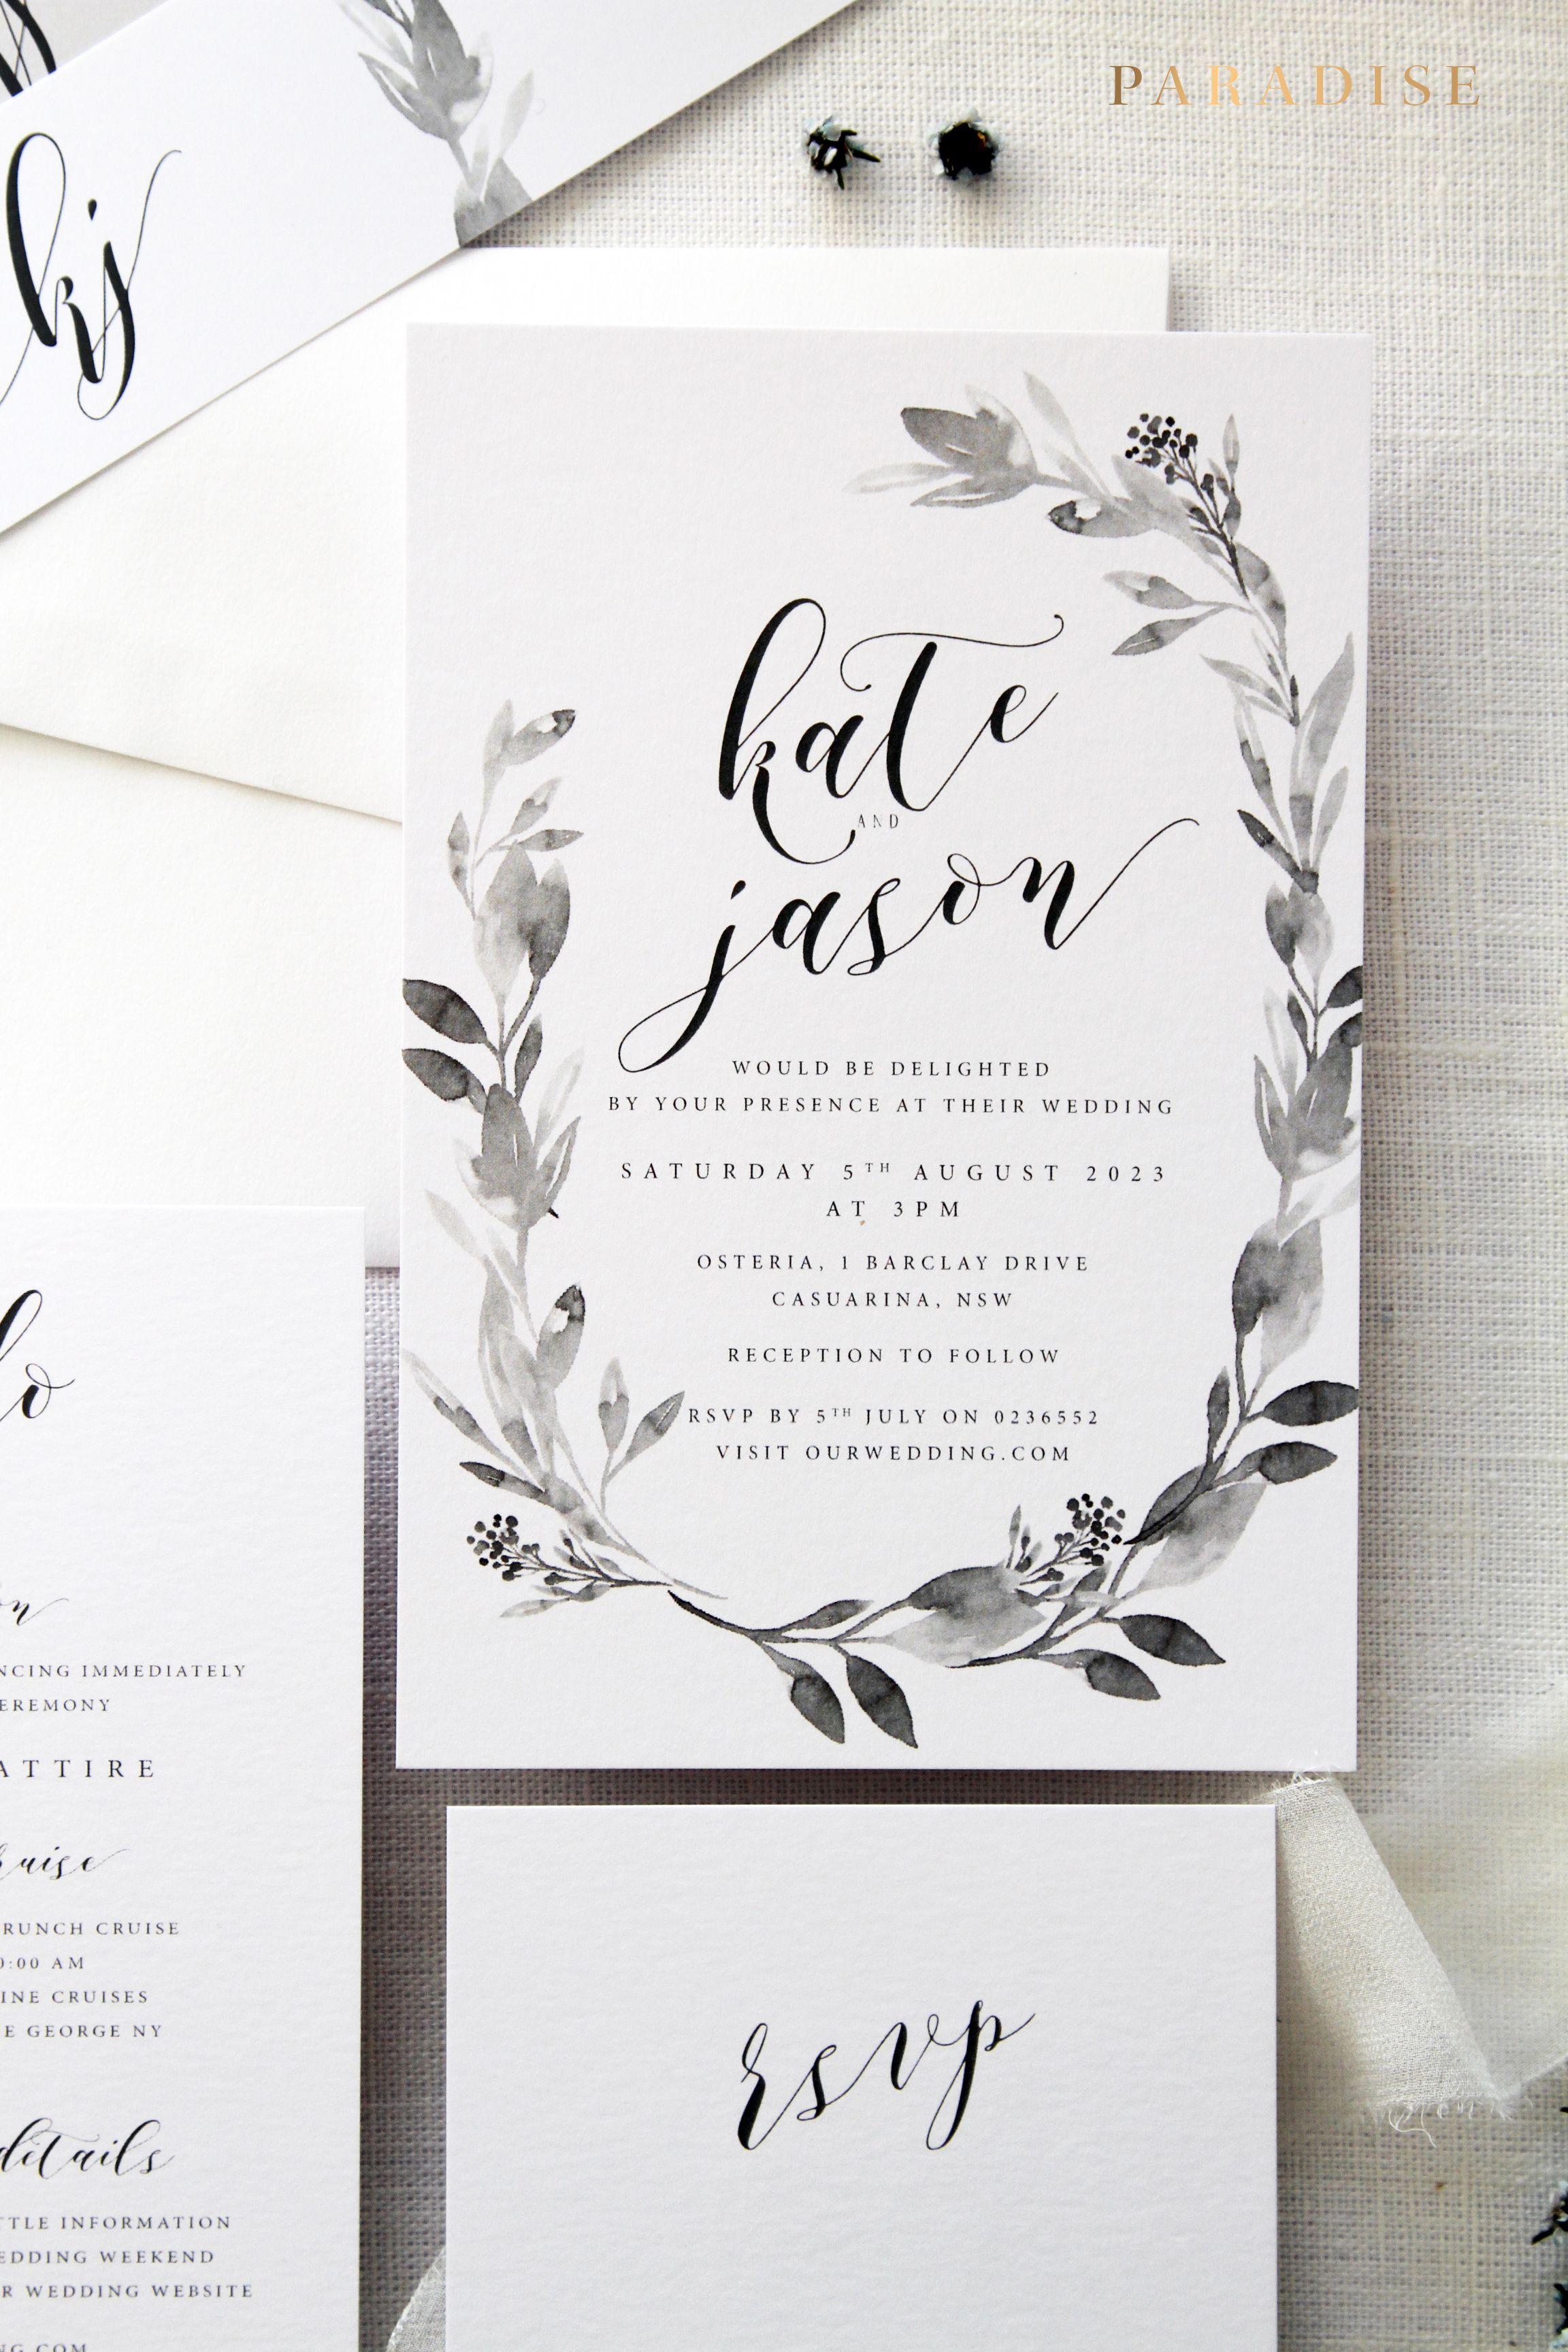 Wedding Invitation Kit | Claudia Wreath Wedding Invitation Sets Monogram Invitation Sets